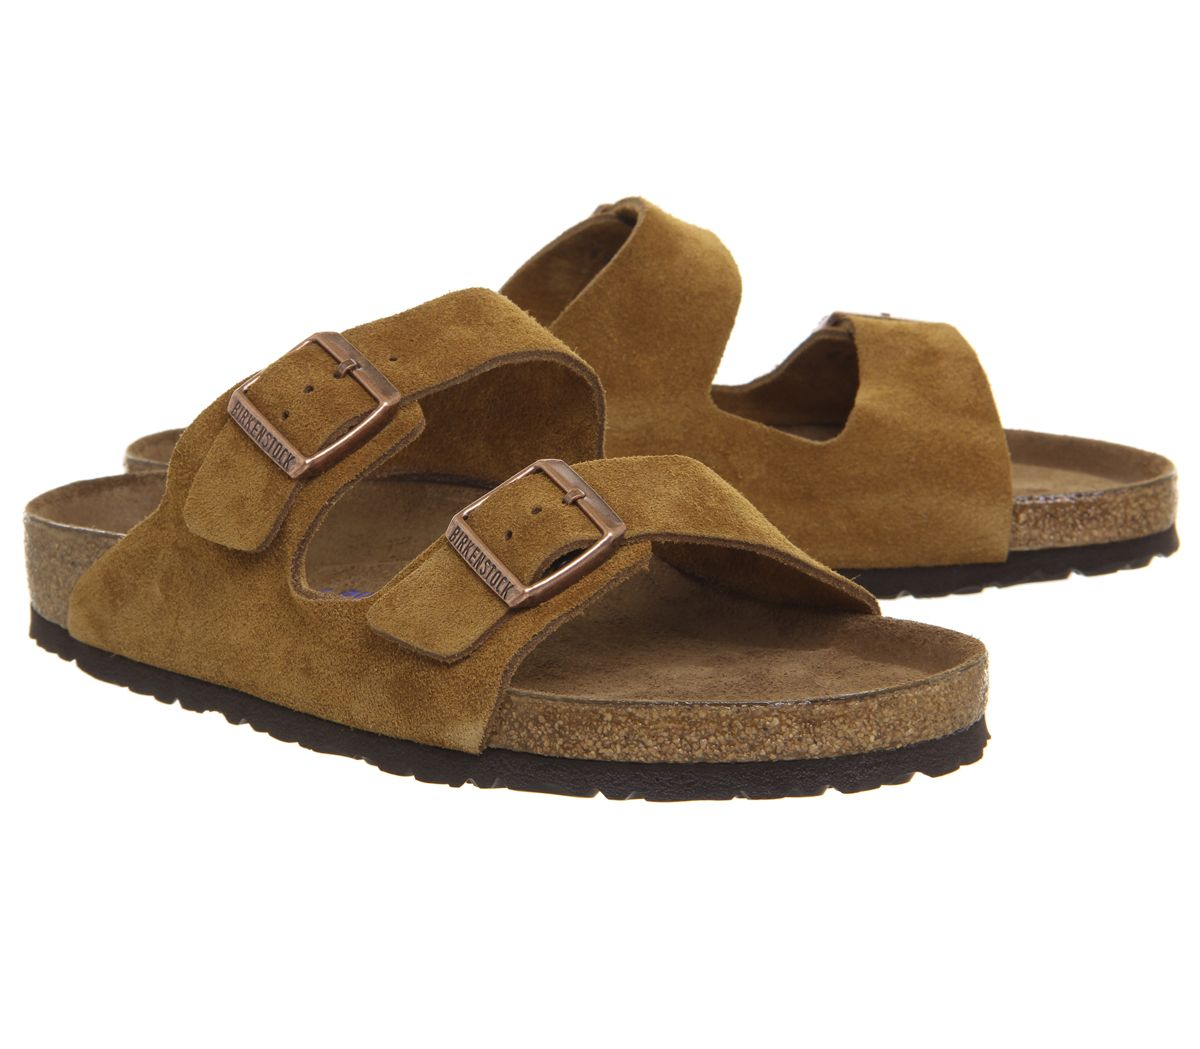 75325af2043a Mens-Birkenstock-Arizona-Two-Strap-Sandals-Mink-Sandals thumbnail